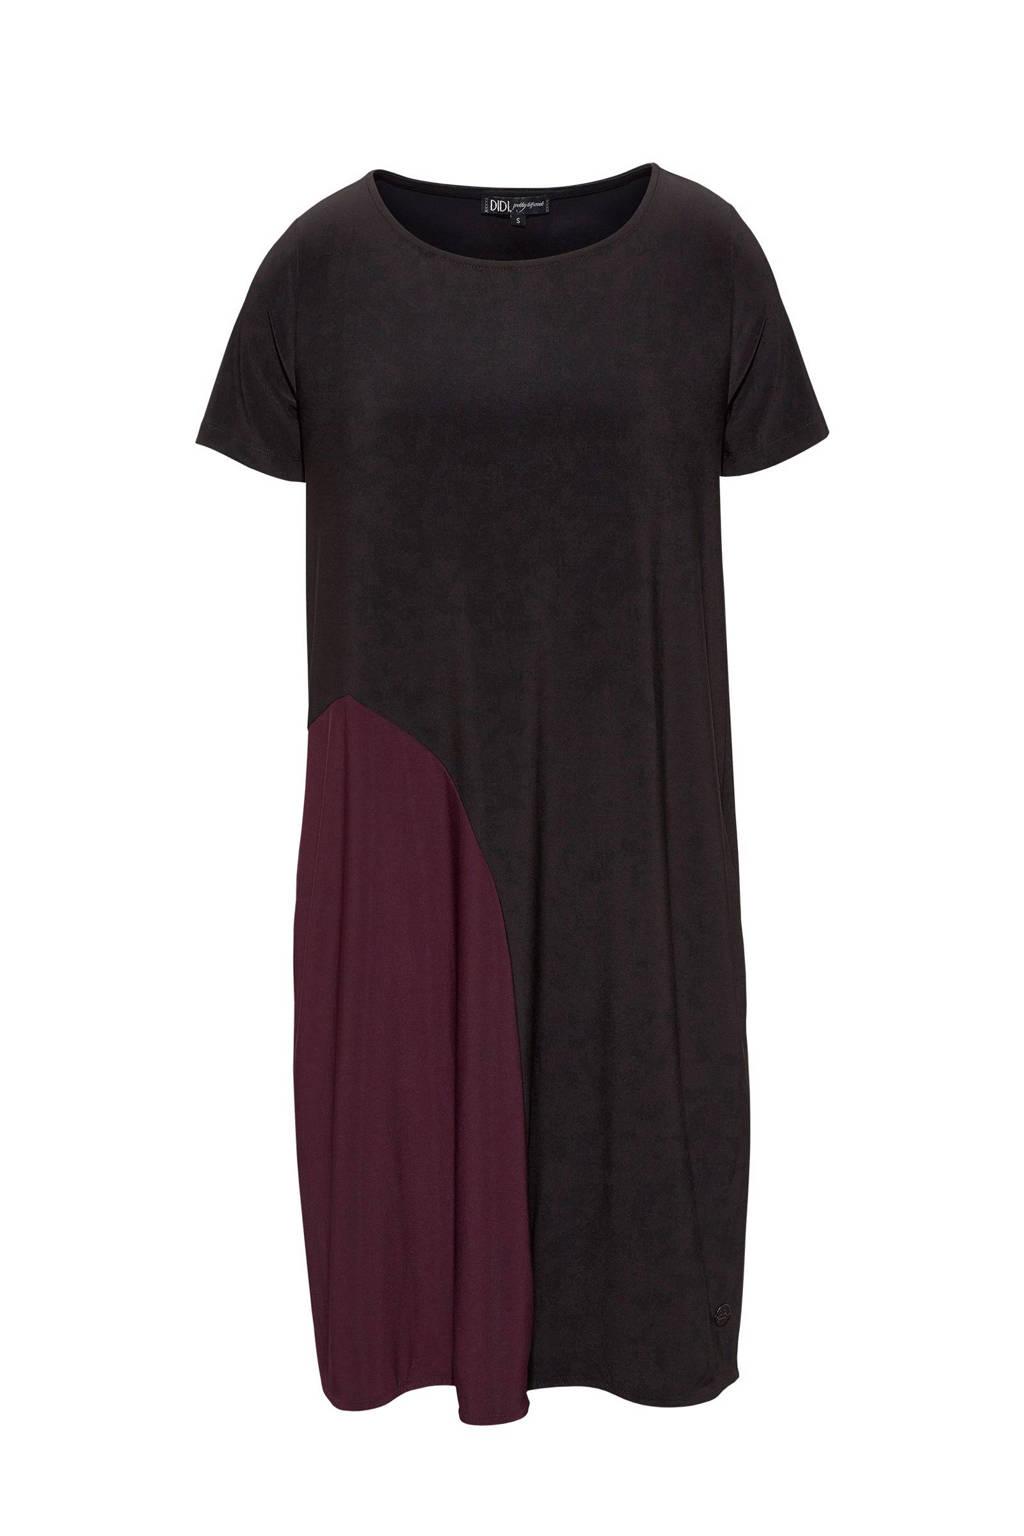 Didi jurk, Zwart/bordeaux